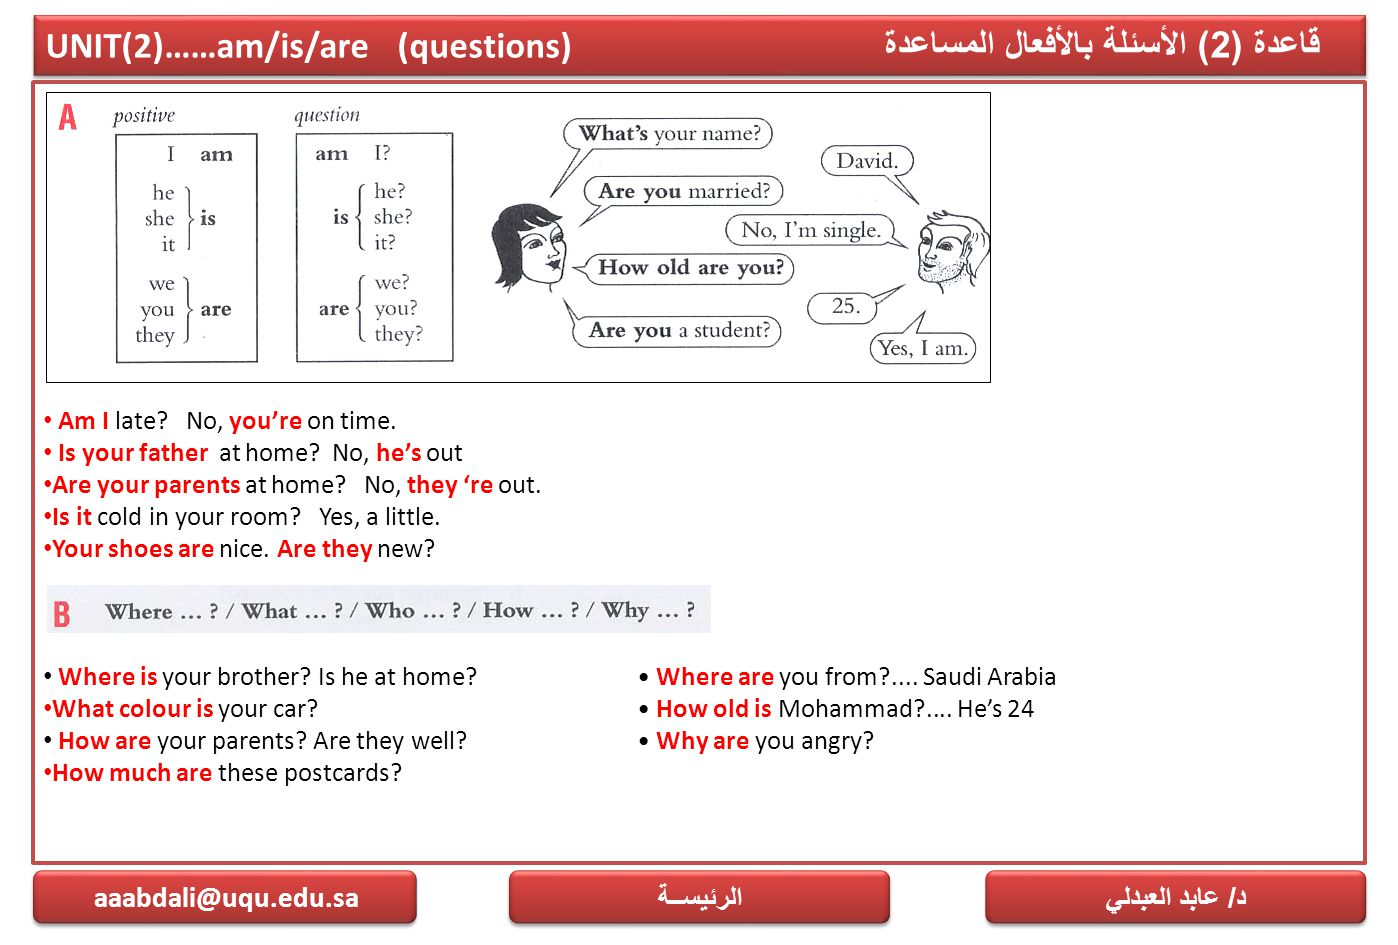 UNIT(2)……am/is/are (questions) قاعدة (2) الأسئلة بالأفعال المساعدة